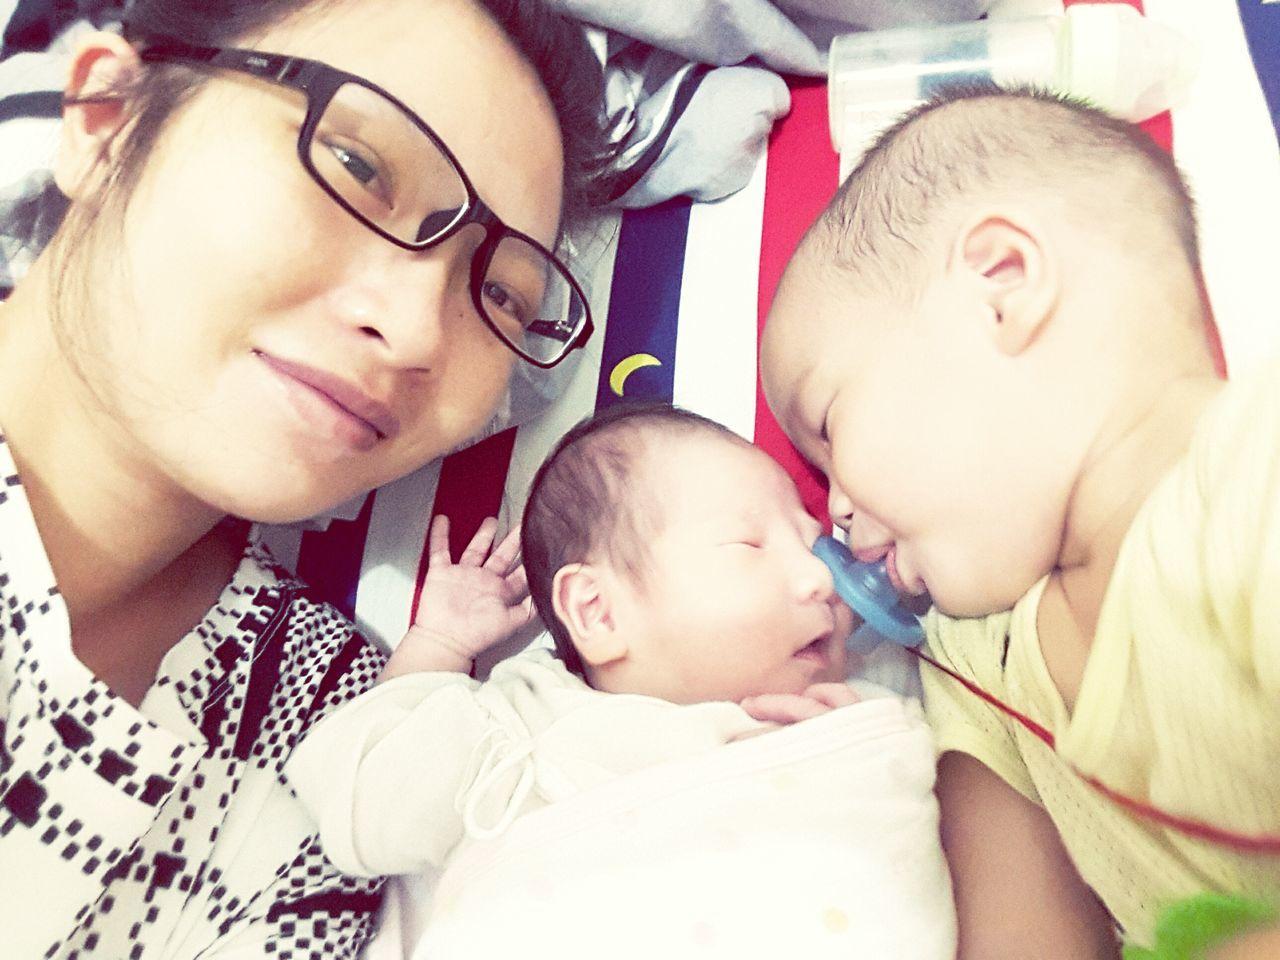 Taiwan Yunlin Mybaby❤ 10day Jayden Brothers Sofi 1y5m 160721 弟弟我可愛的寶貝兒子們,你們要乖乖聽話長大喔!mammy會永遠愛你們的😚😚😚❤❤❤弟弟出生於 160711